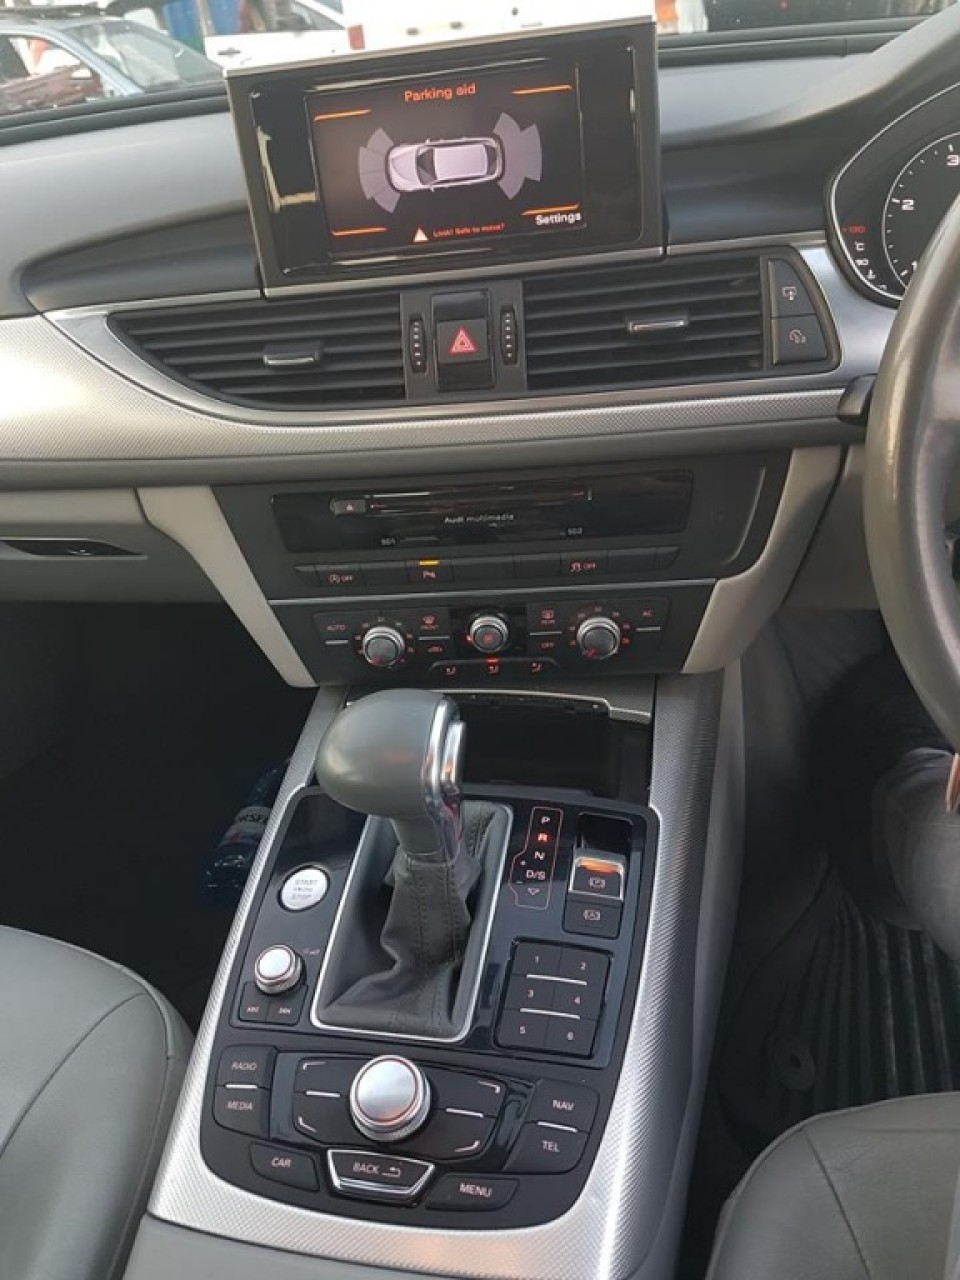 Maneta stergatoare Audi A6 4G C7 2012 variant 2.0 tdi